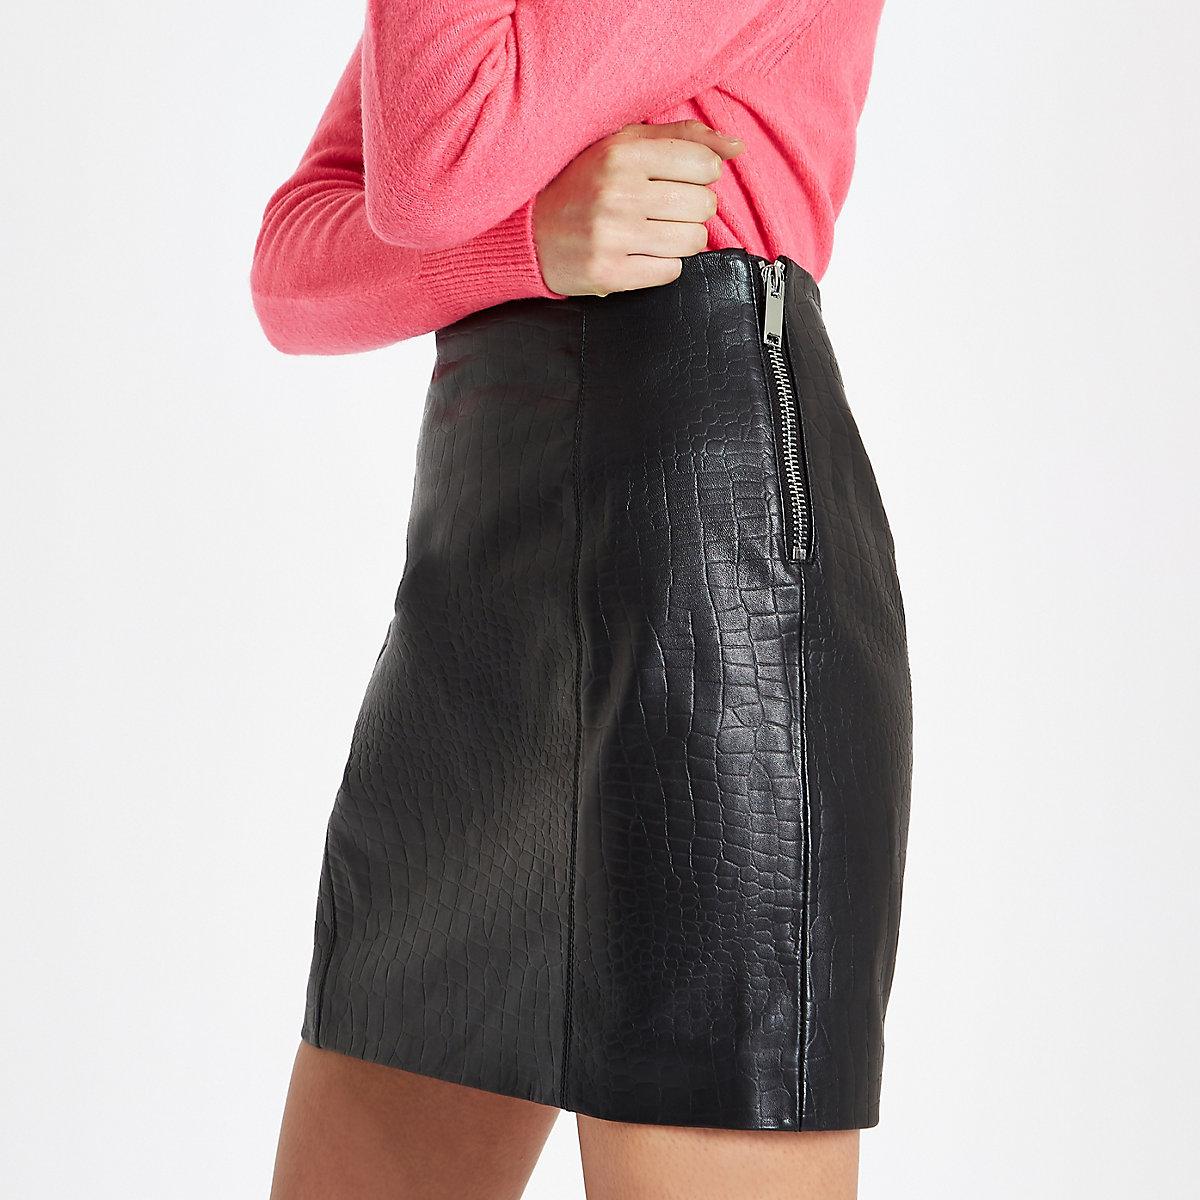 Black leather croc side zip mini skirt